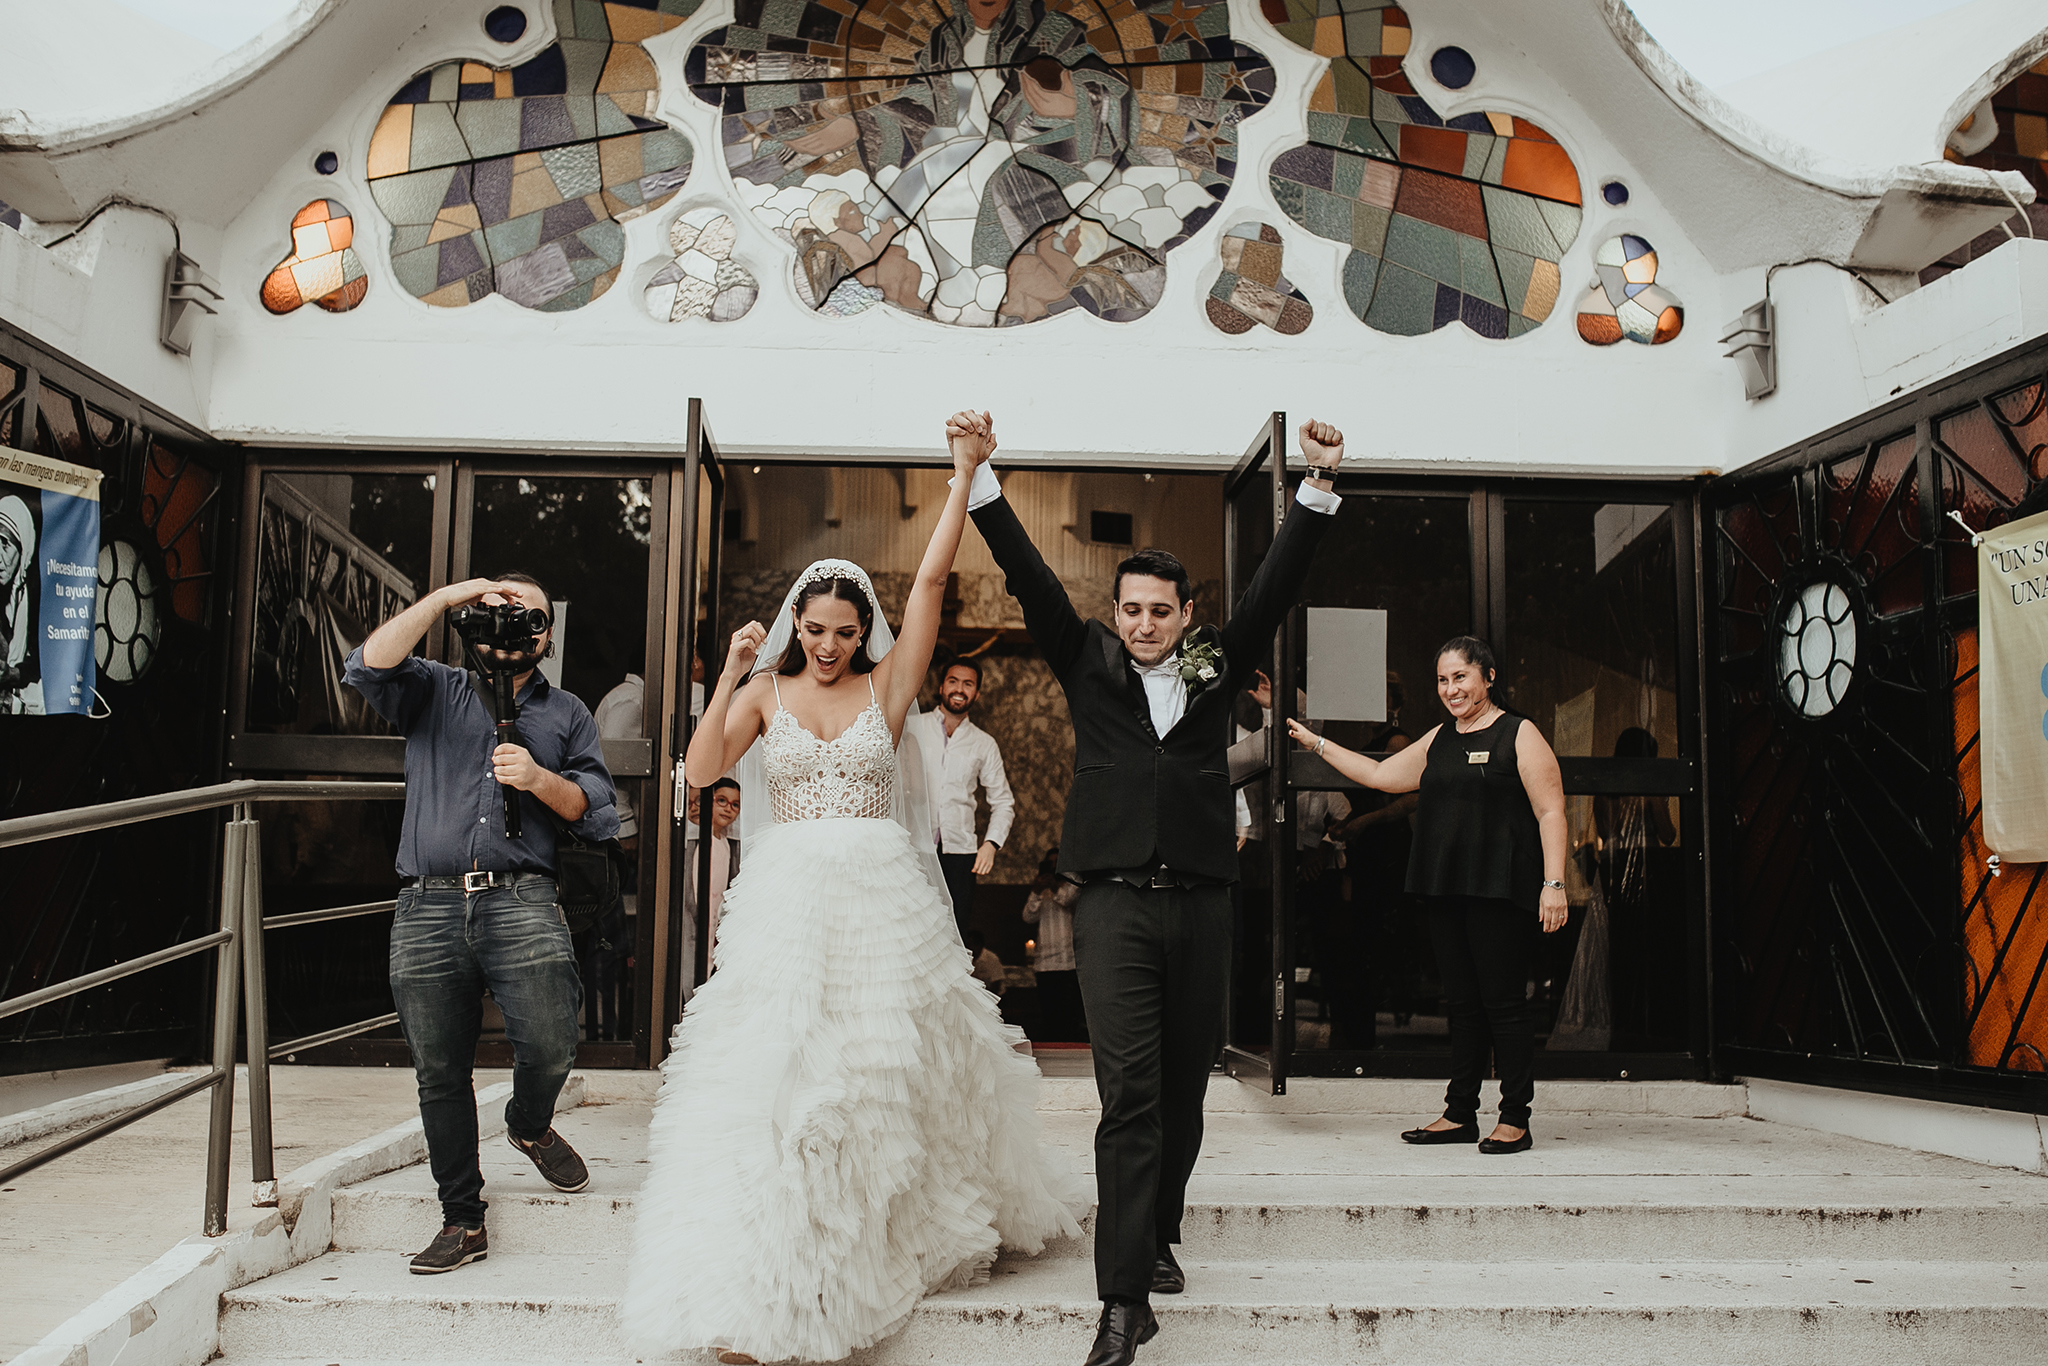 0796R&F__WeddingDestination_Weddingmerida_BodaMexico_FotografoDeBodas_FabrizioSimoneenFotografo.jpg